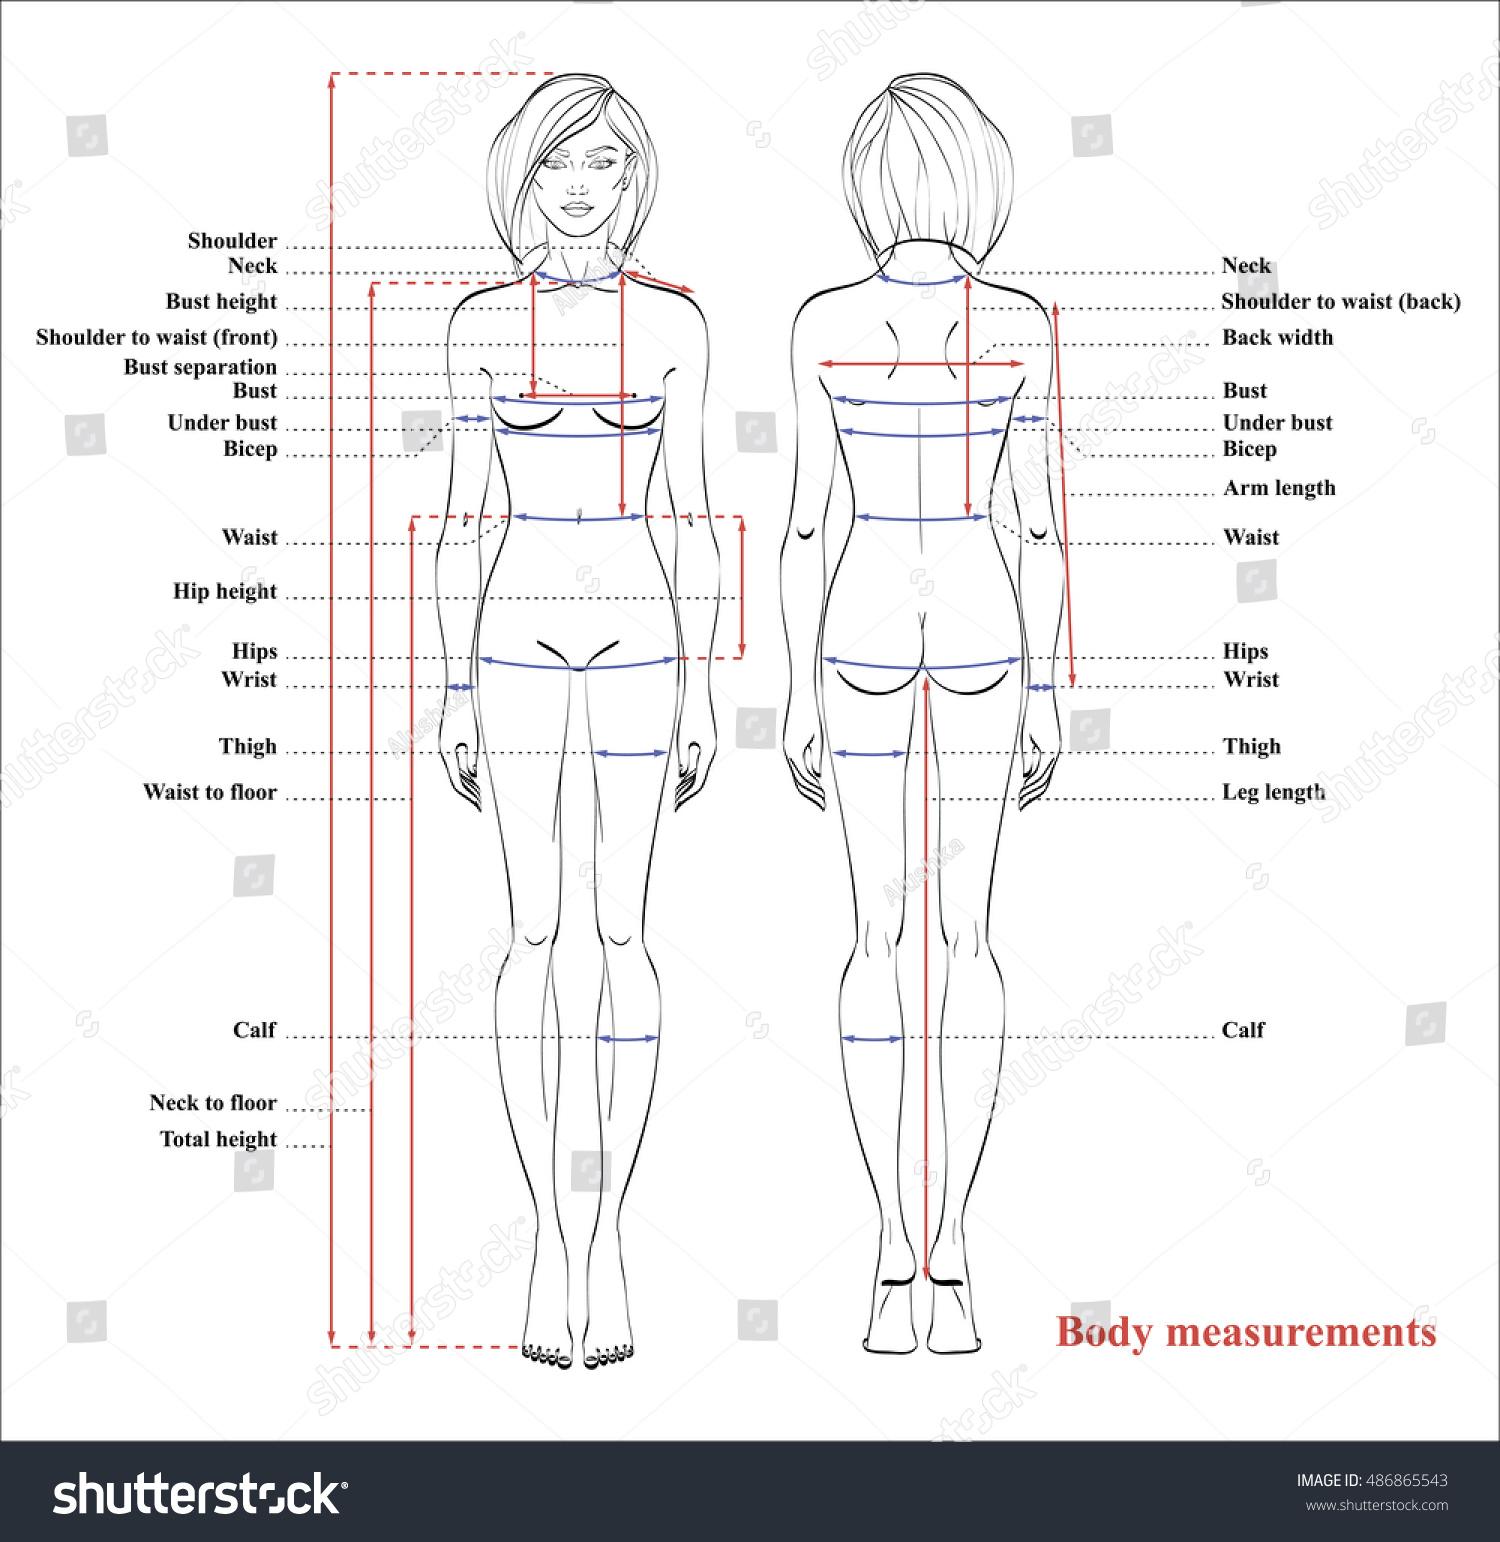 Woman Body Measurement Chart  Scheme For Measurement Human